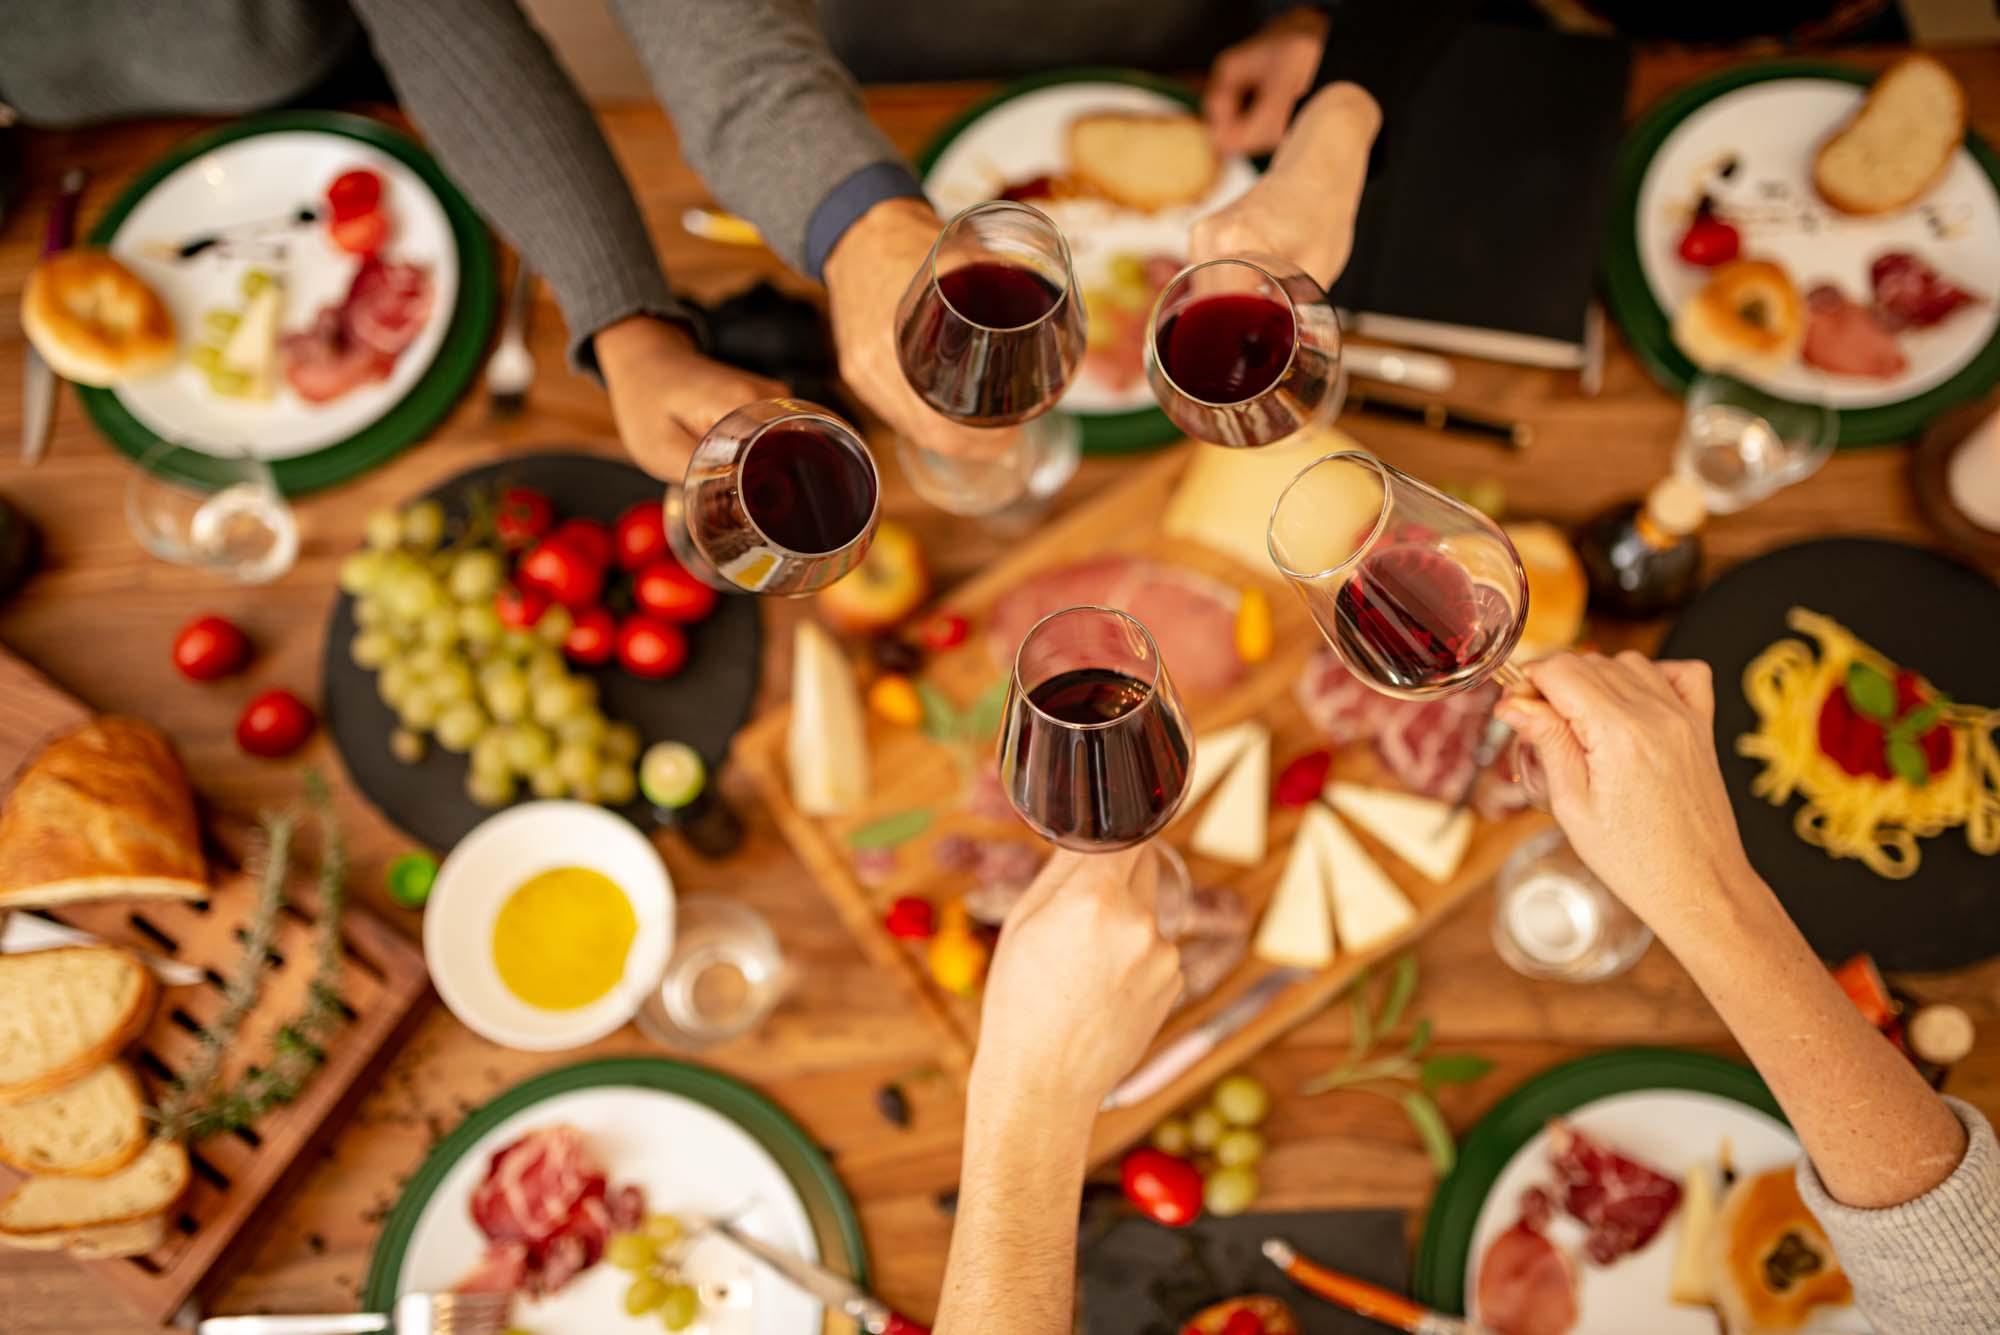 Corsi Di Cucina Cene Aziendali a Torino